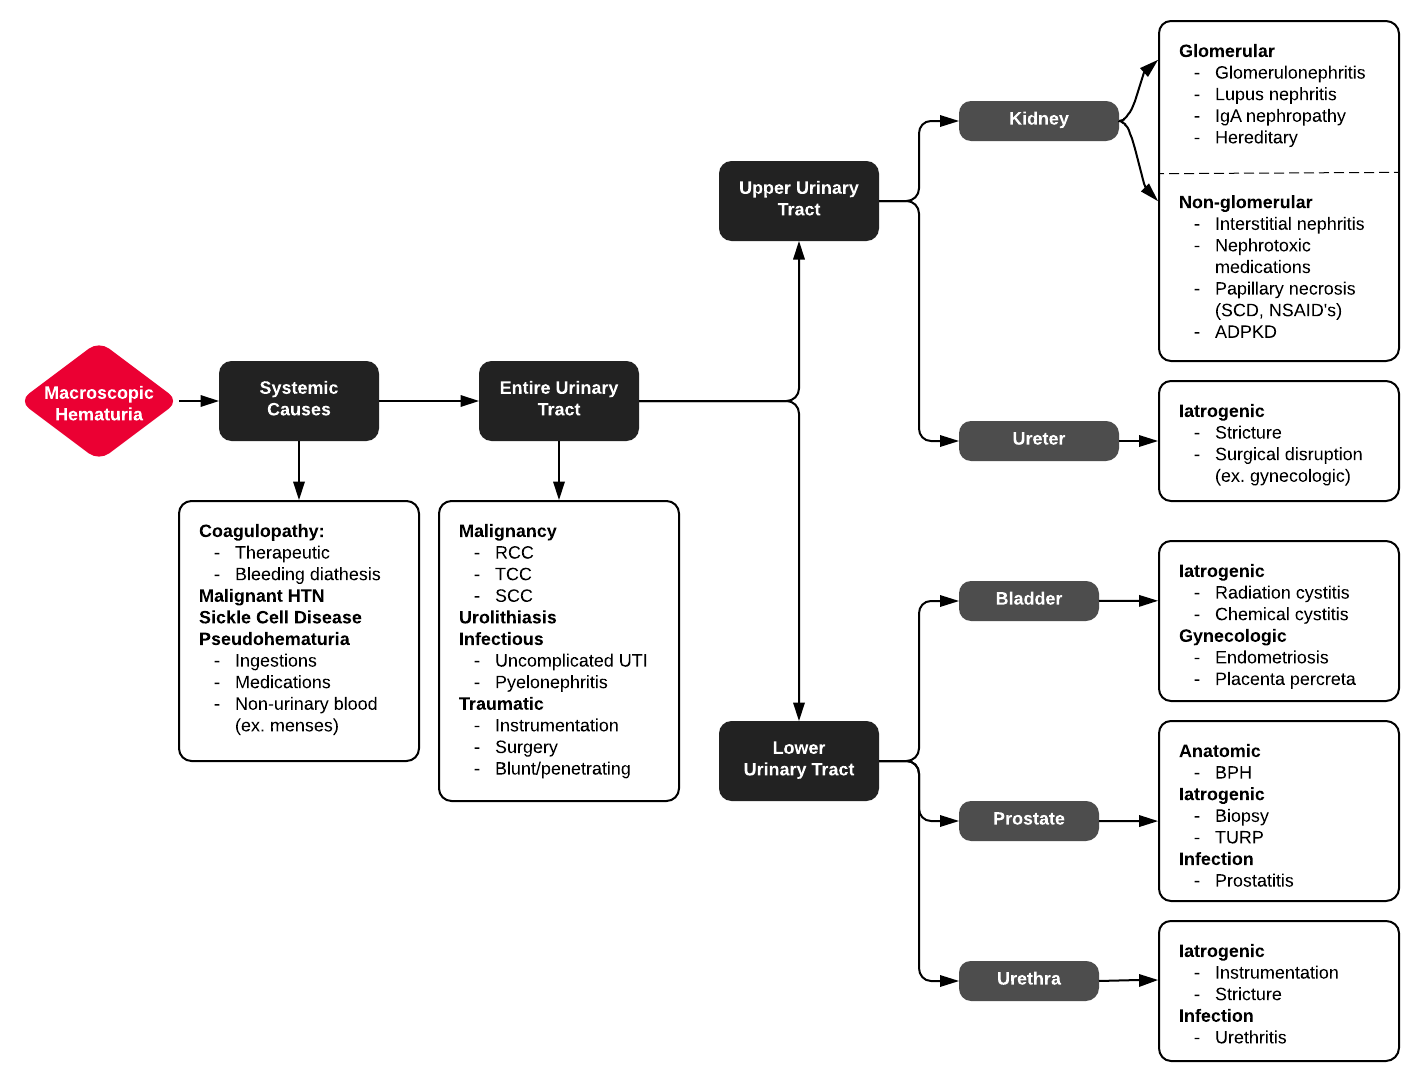 Full ddxof.com article for Macroscopic Hematuria can be found at  https://ddxof.com/macroscopic-hematuria/